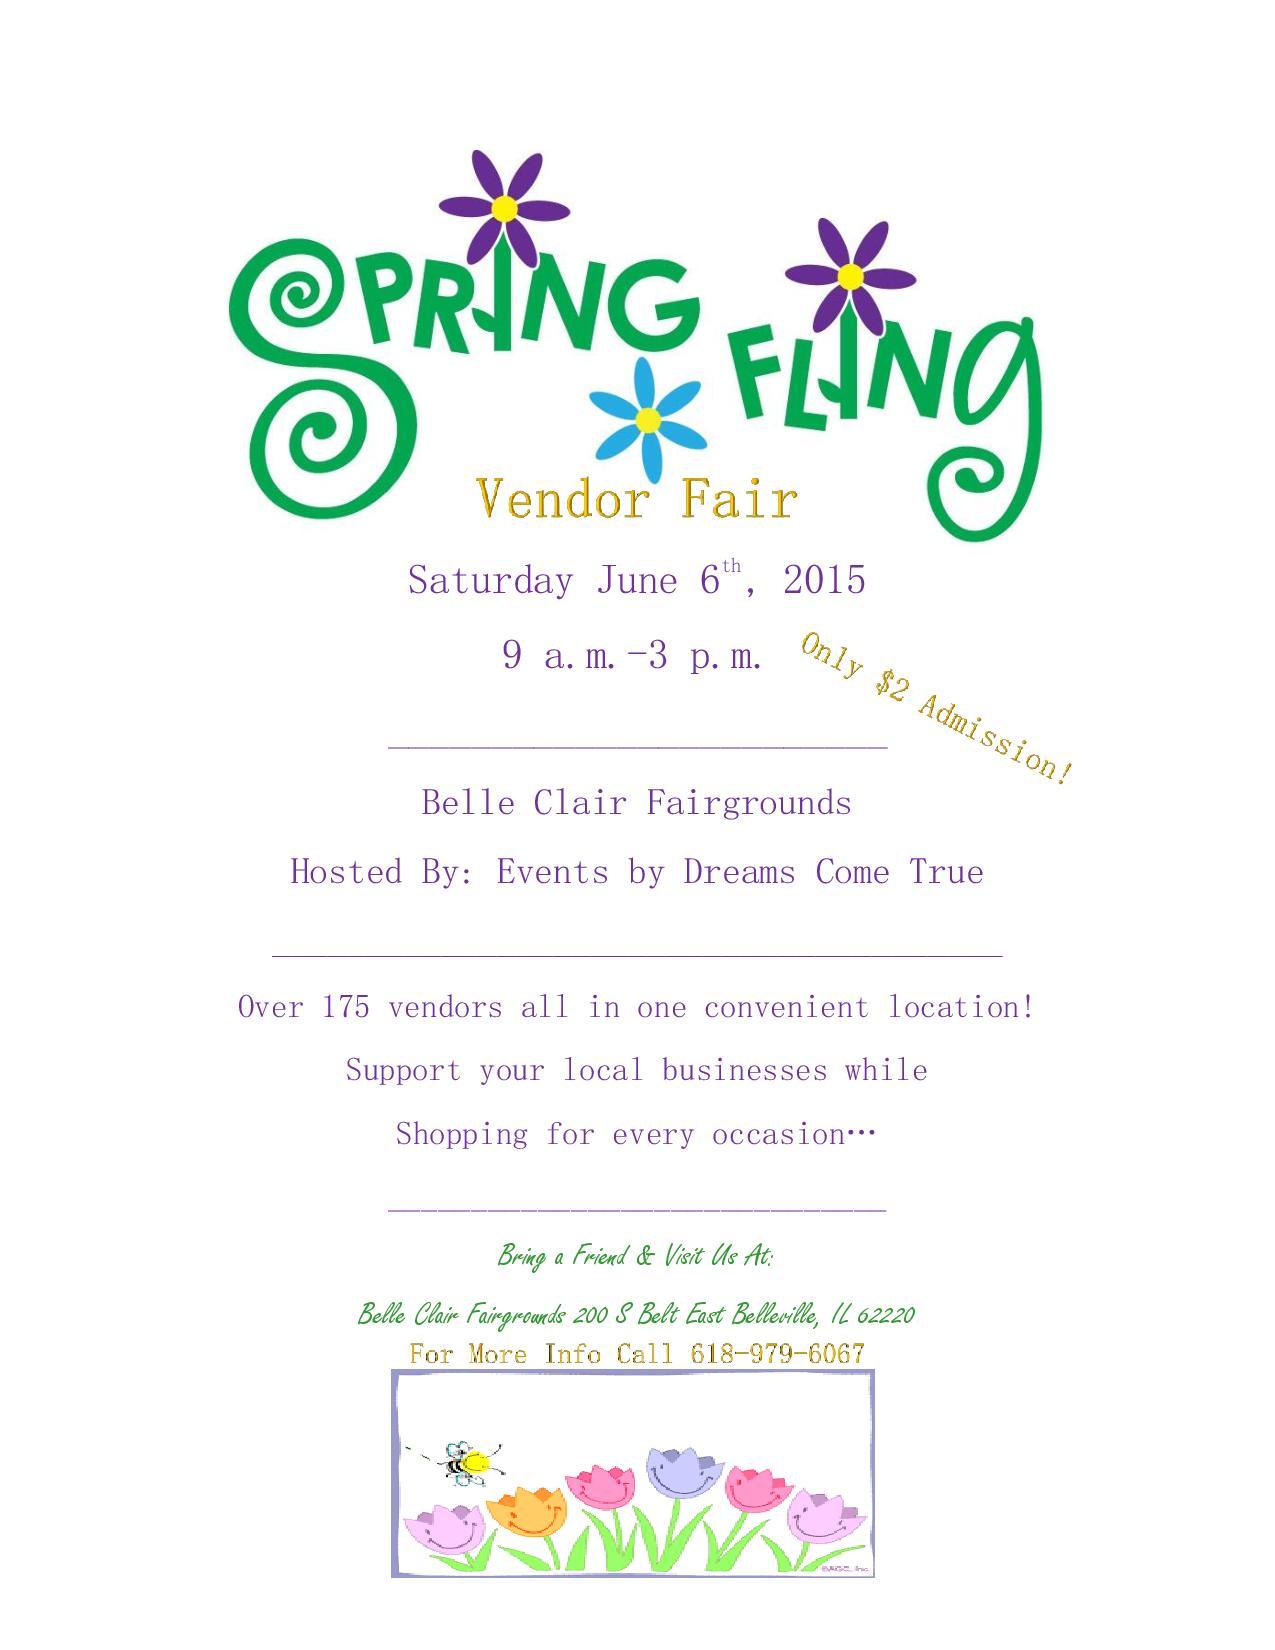 Spring Vendor Fair Flyer Carnavalsmusic